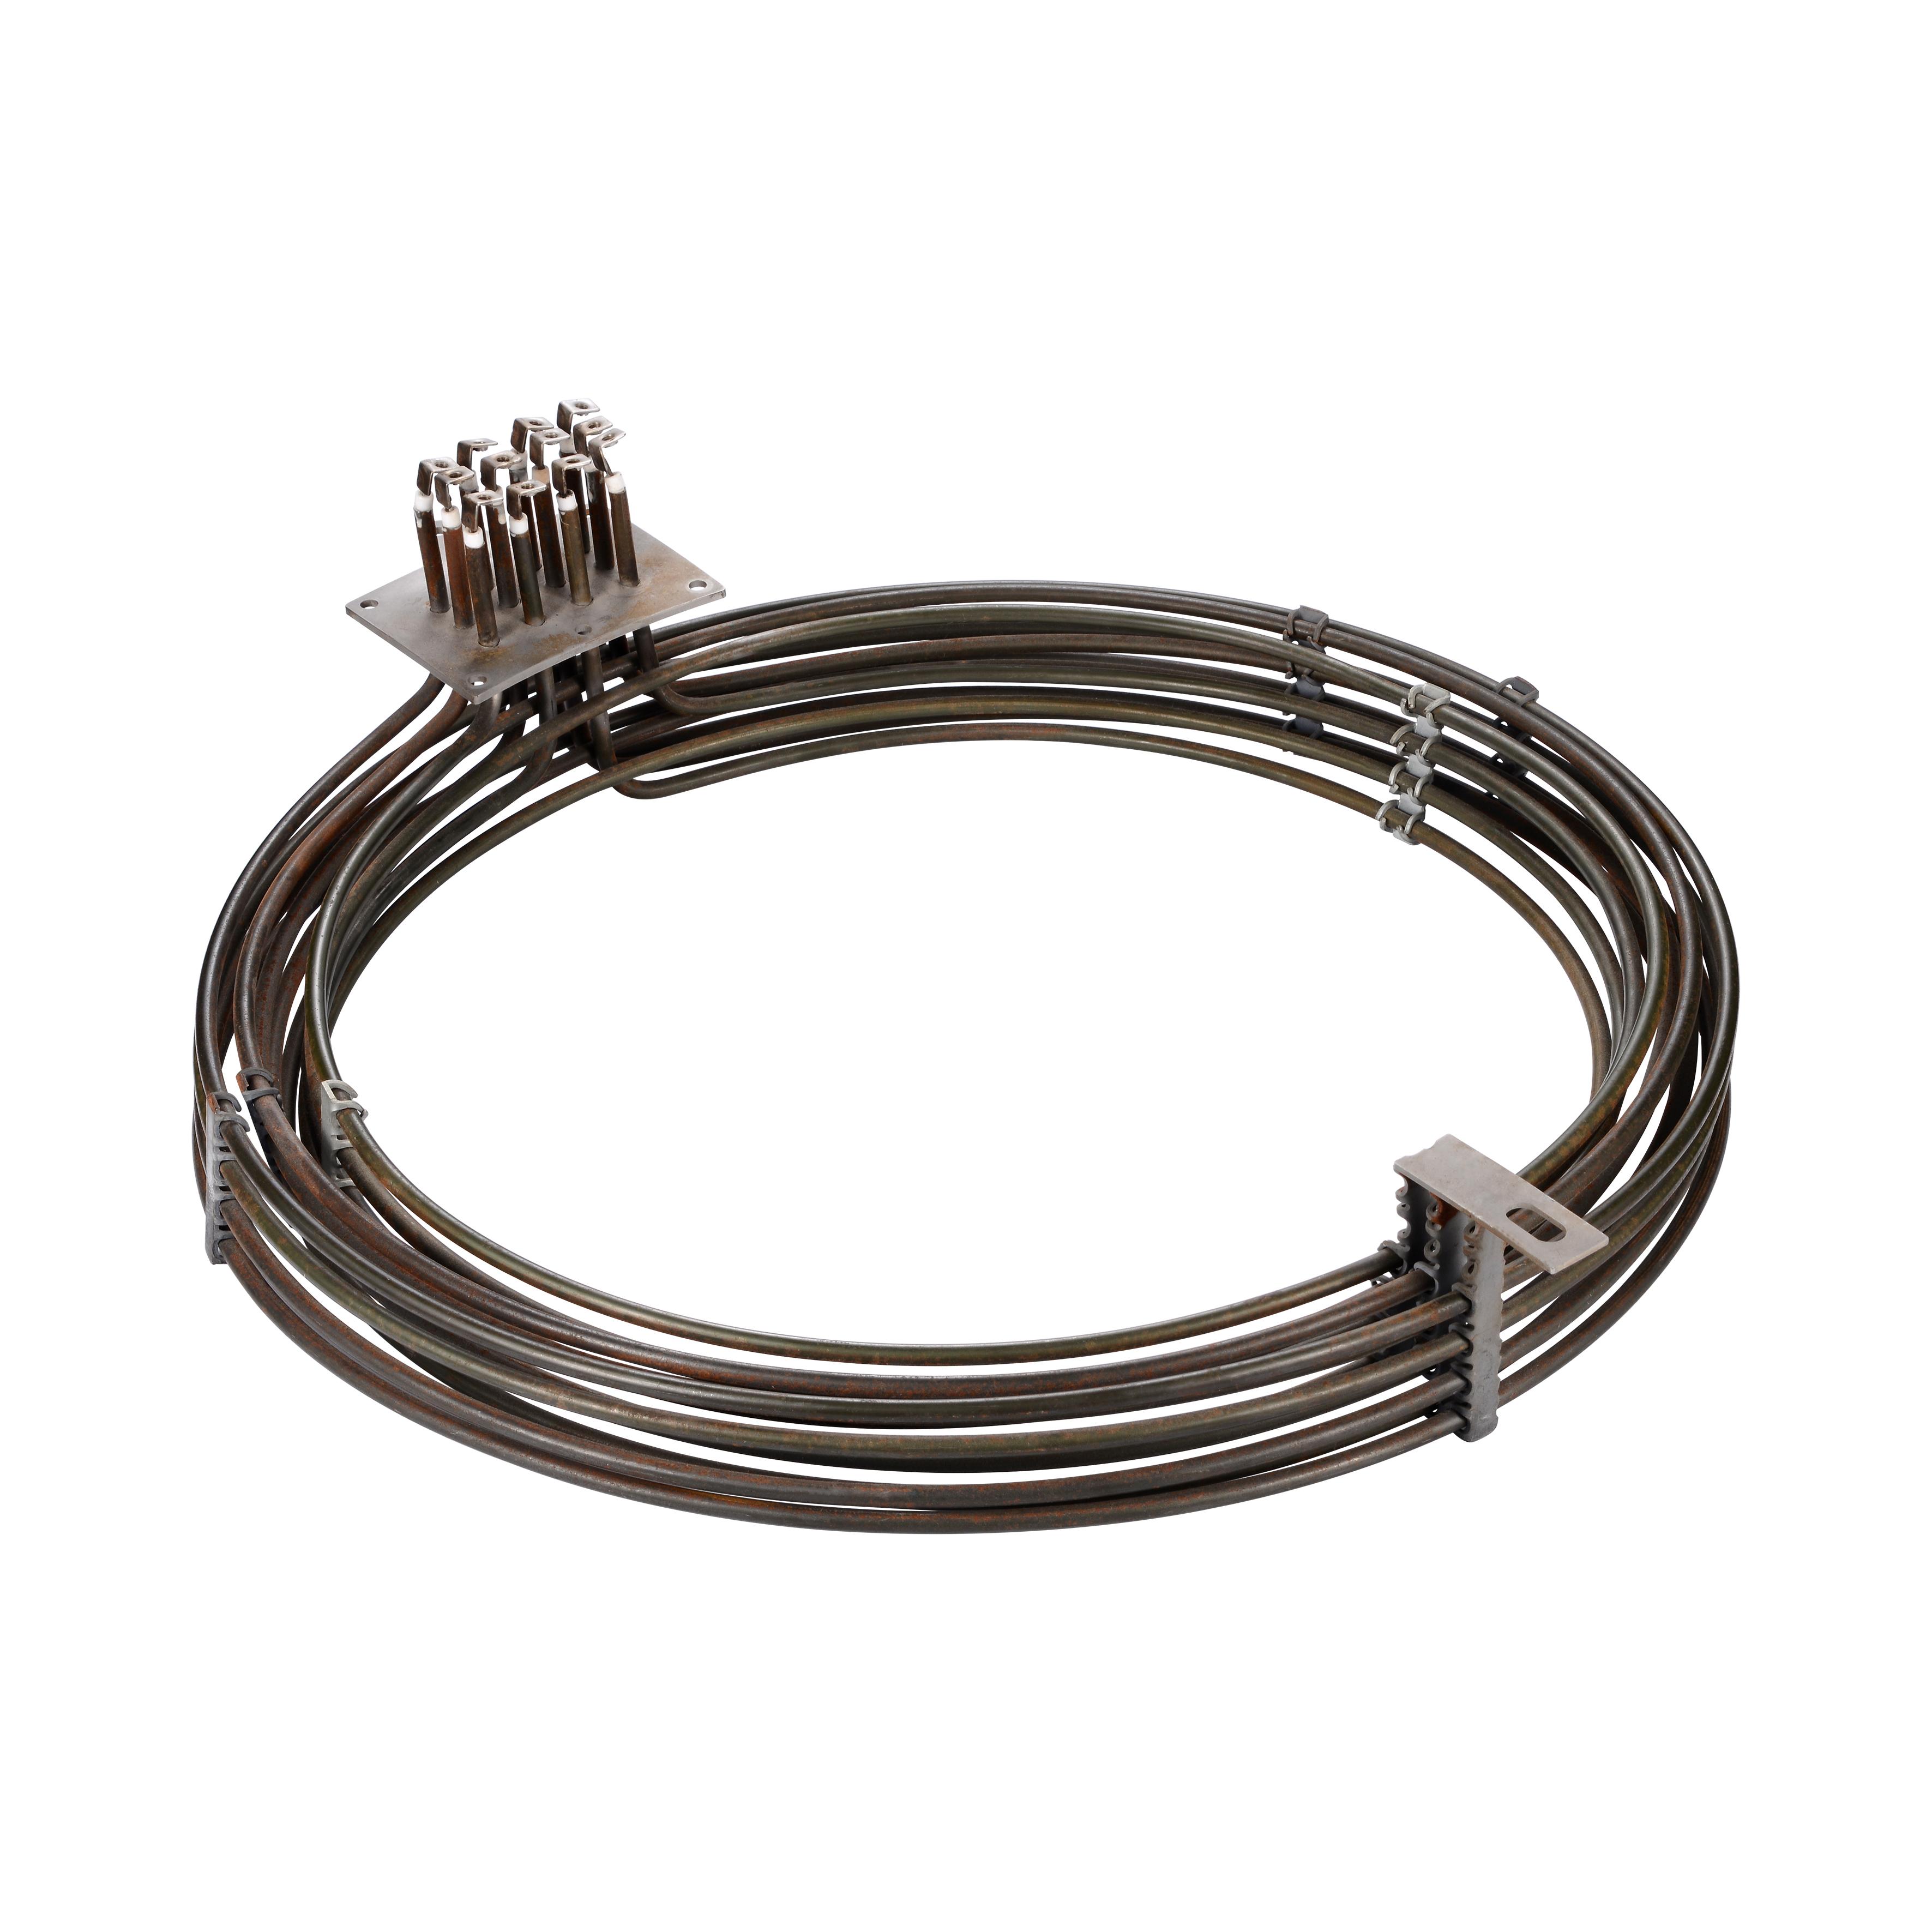 Latest Design Superior Quality Safe Tubular Rotary Oven Heating Element